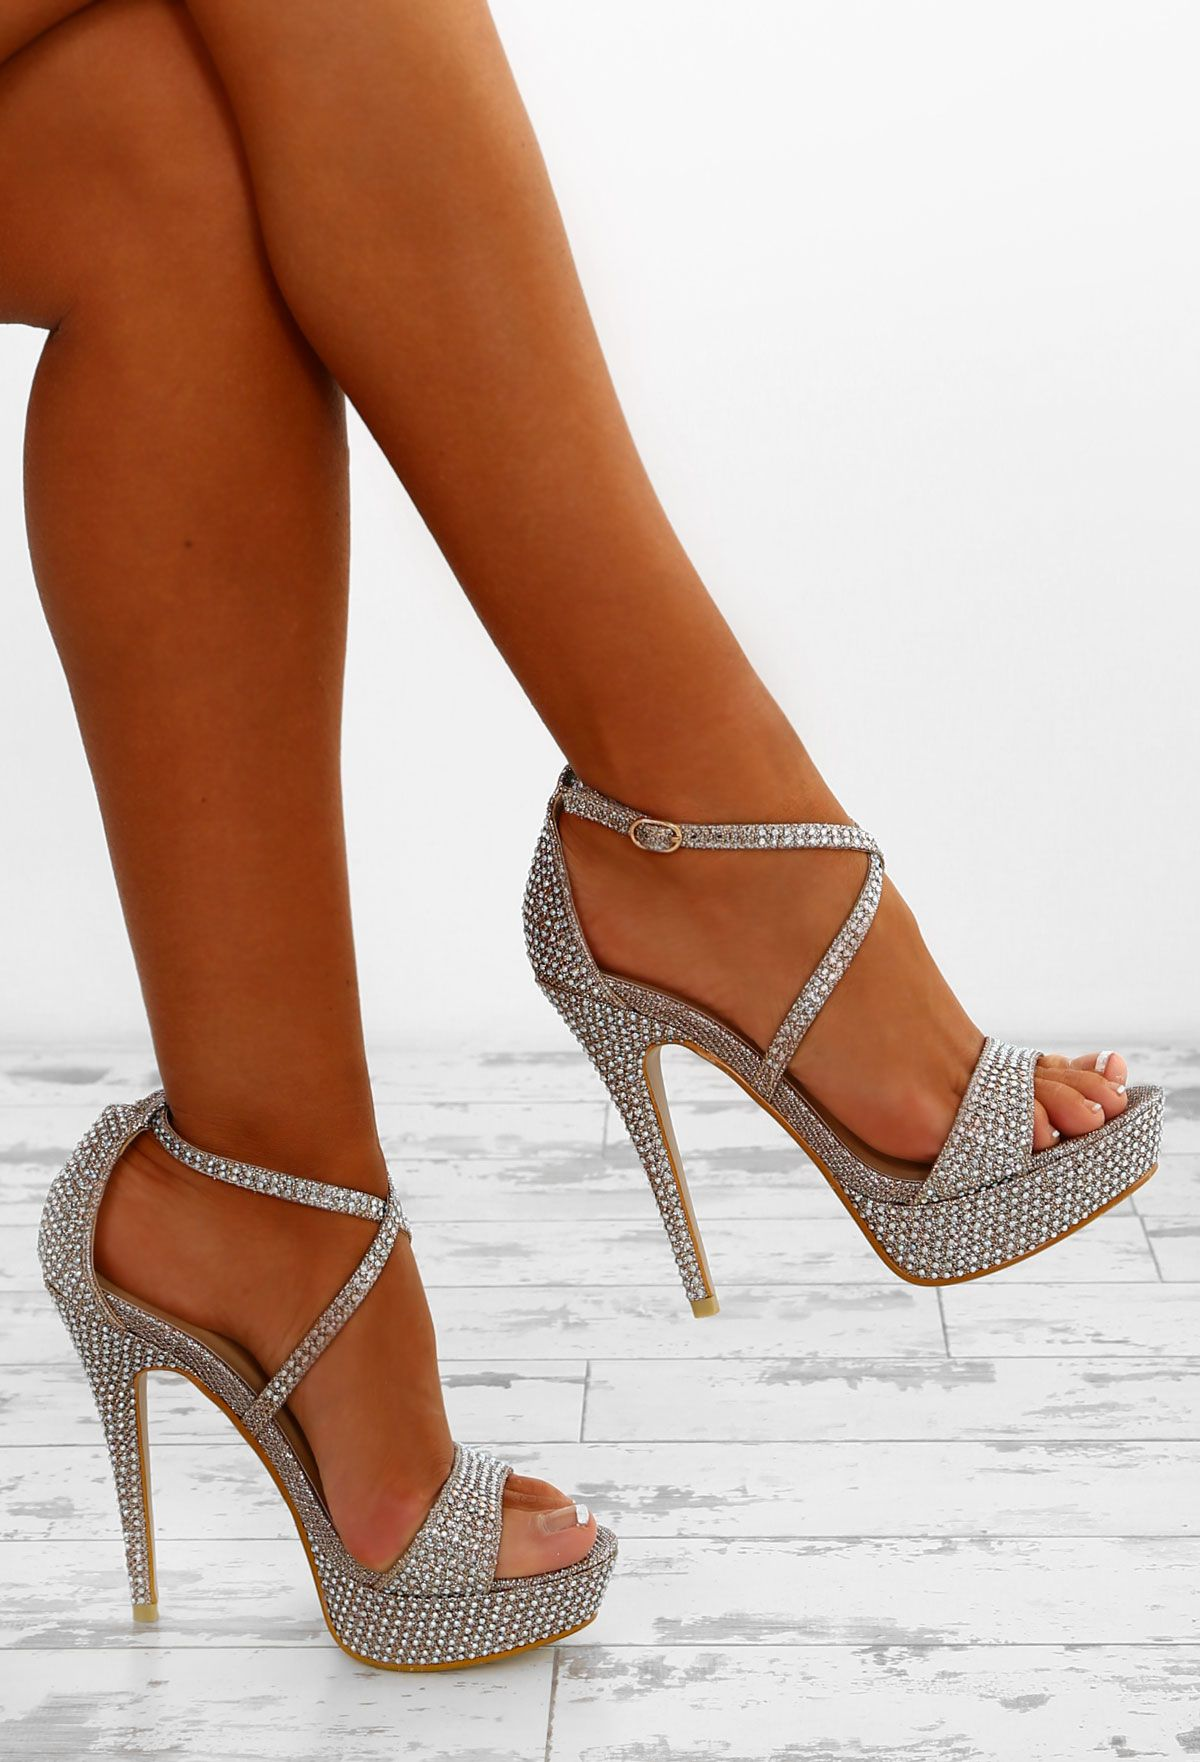 9dea9cdb6 Shop women s footwear at Pink Boutique - get your high heels ...